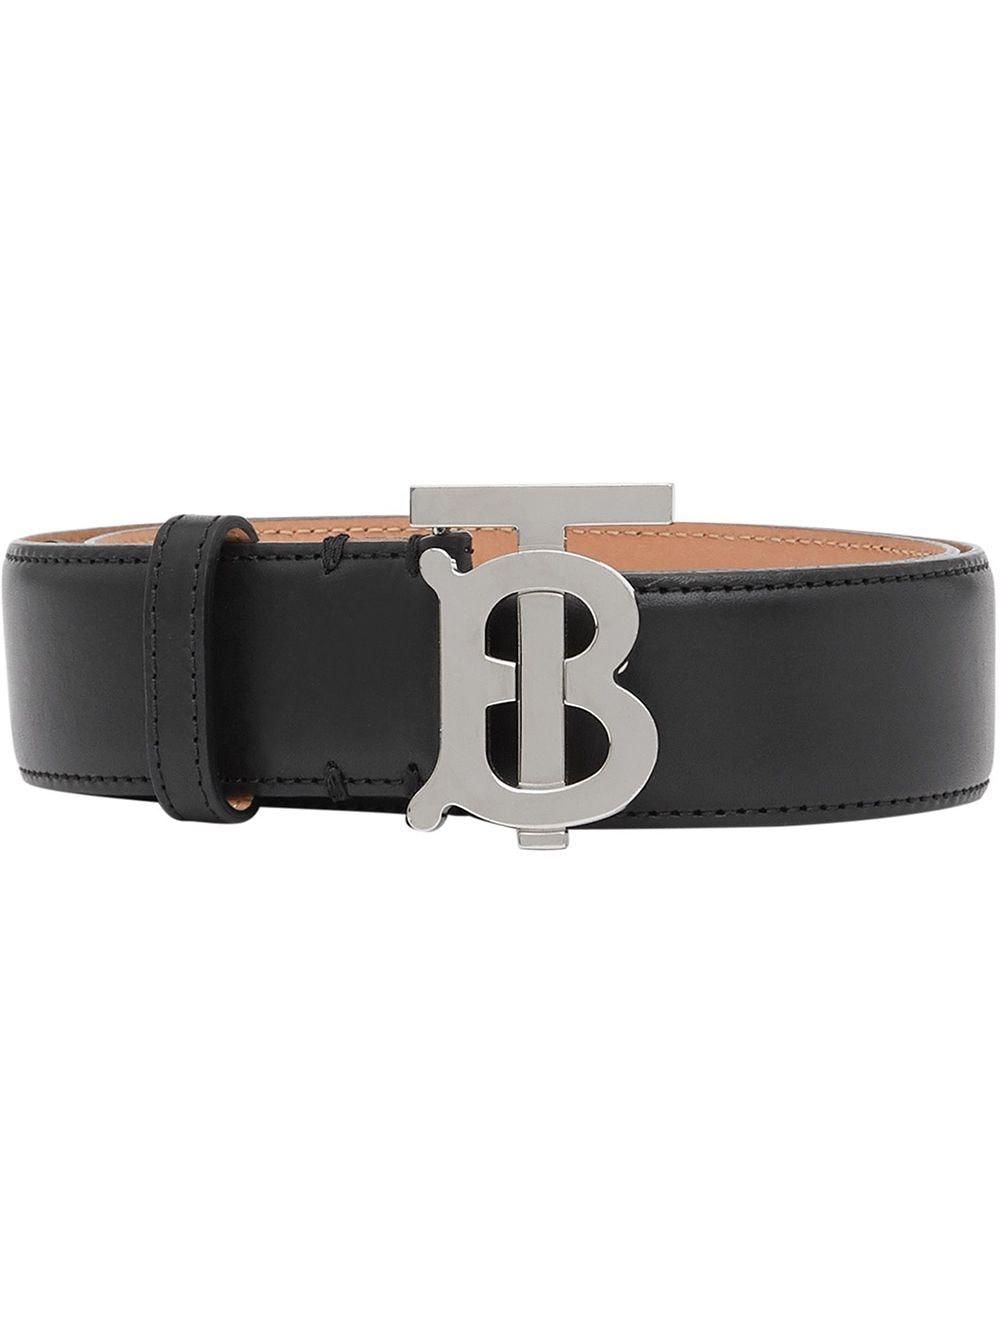 Picture of Burberry | Monogram Motif Belt